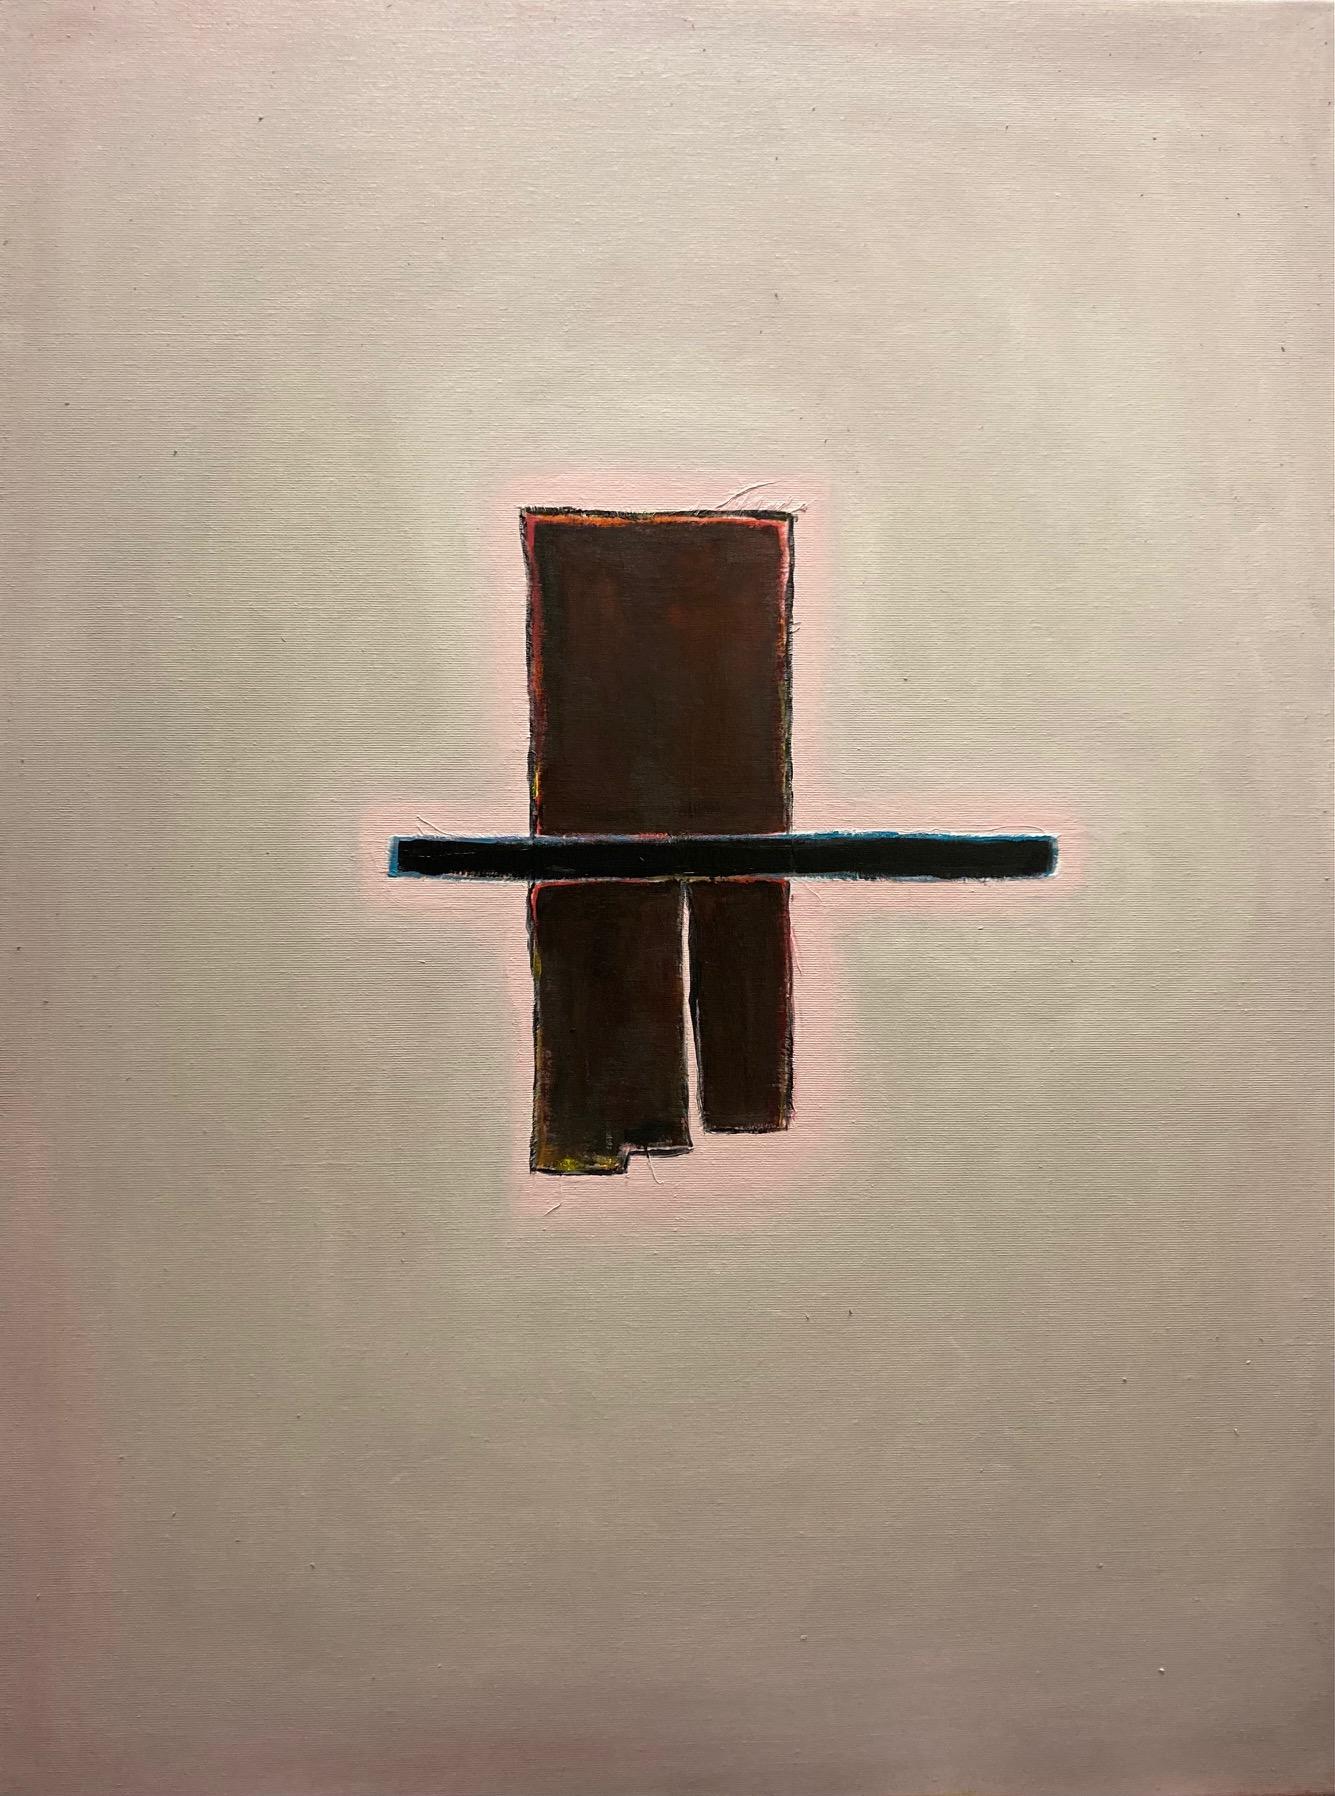 Silent Sign (3), Öl auf Leinwand, 80 x 60 cm, 2020